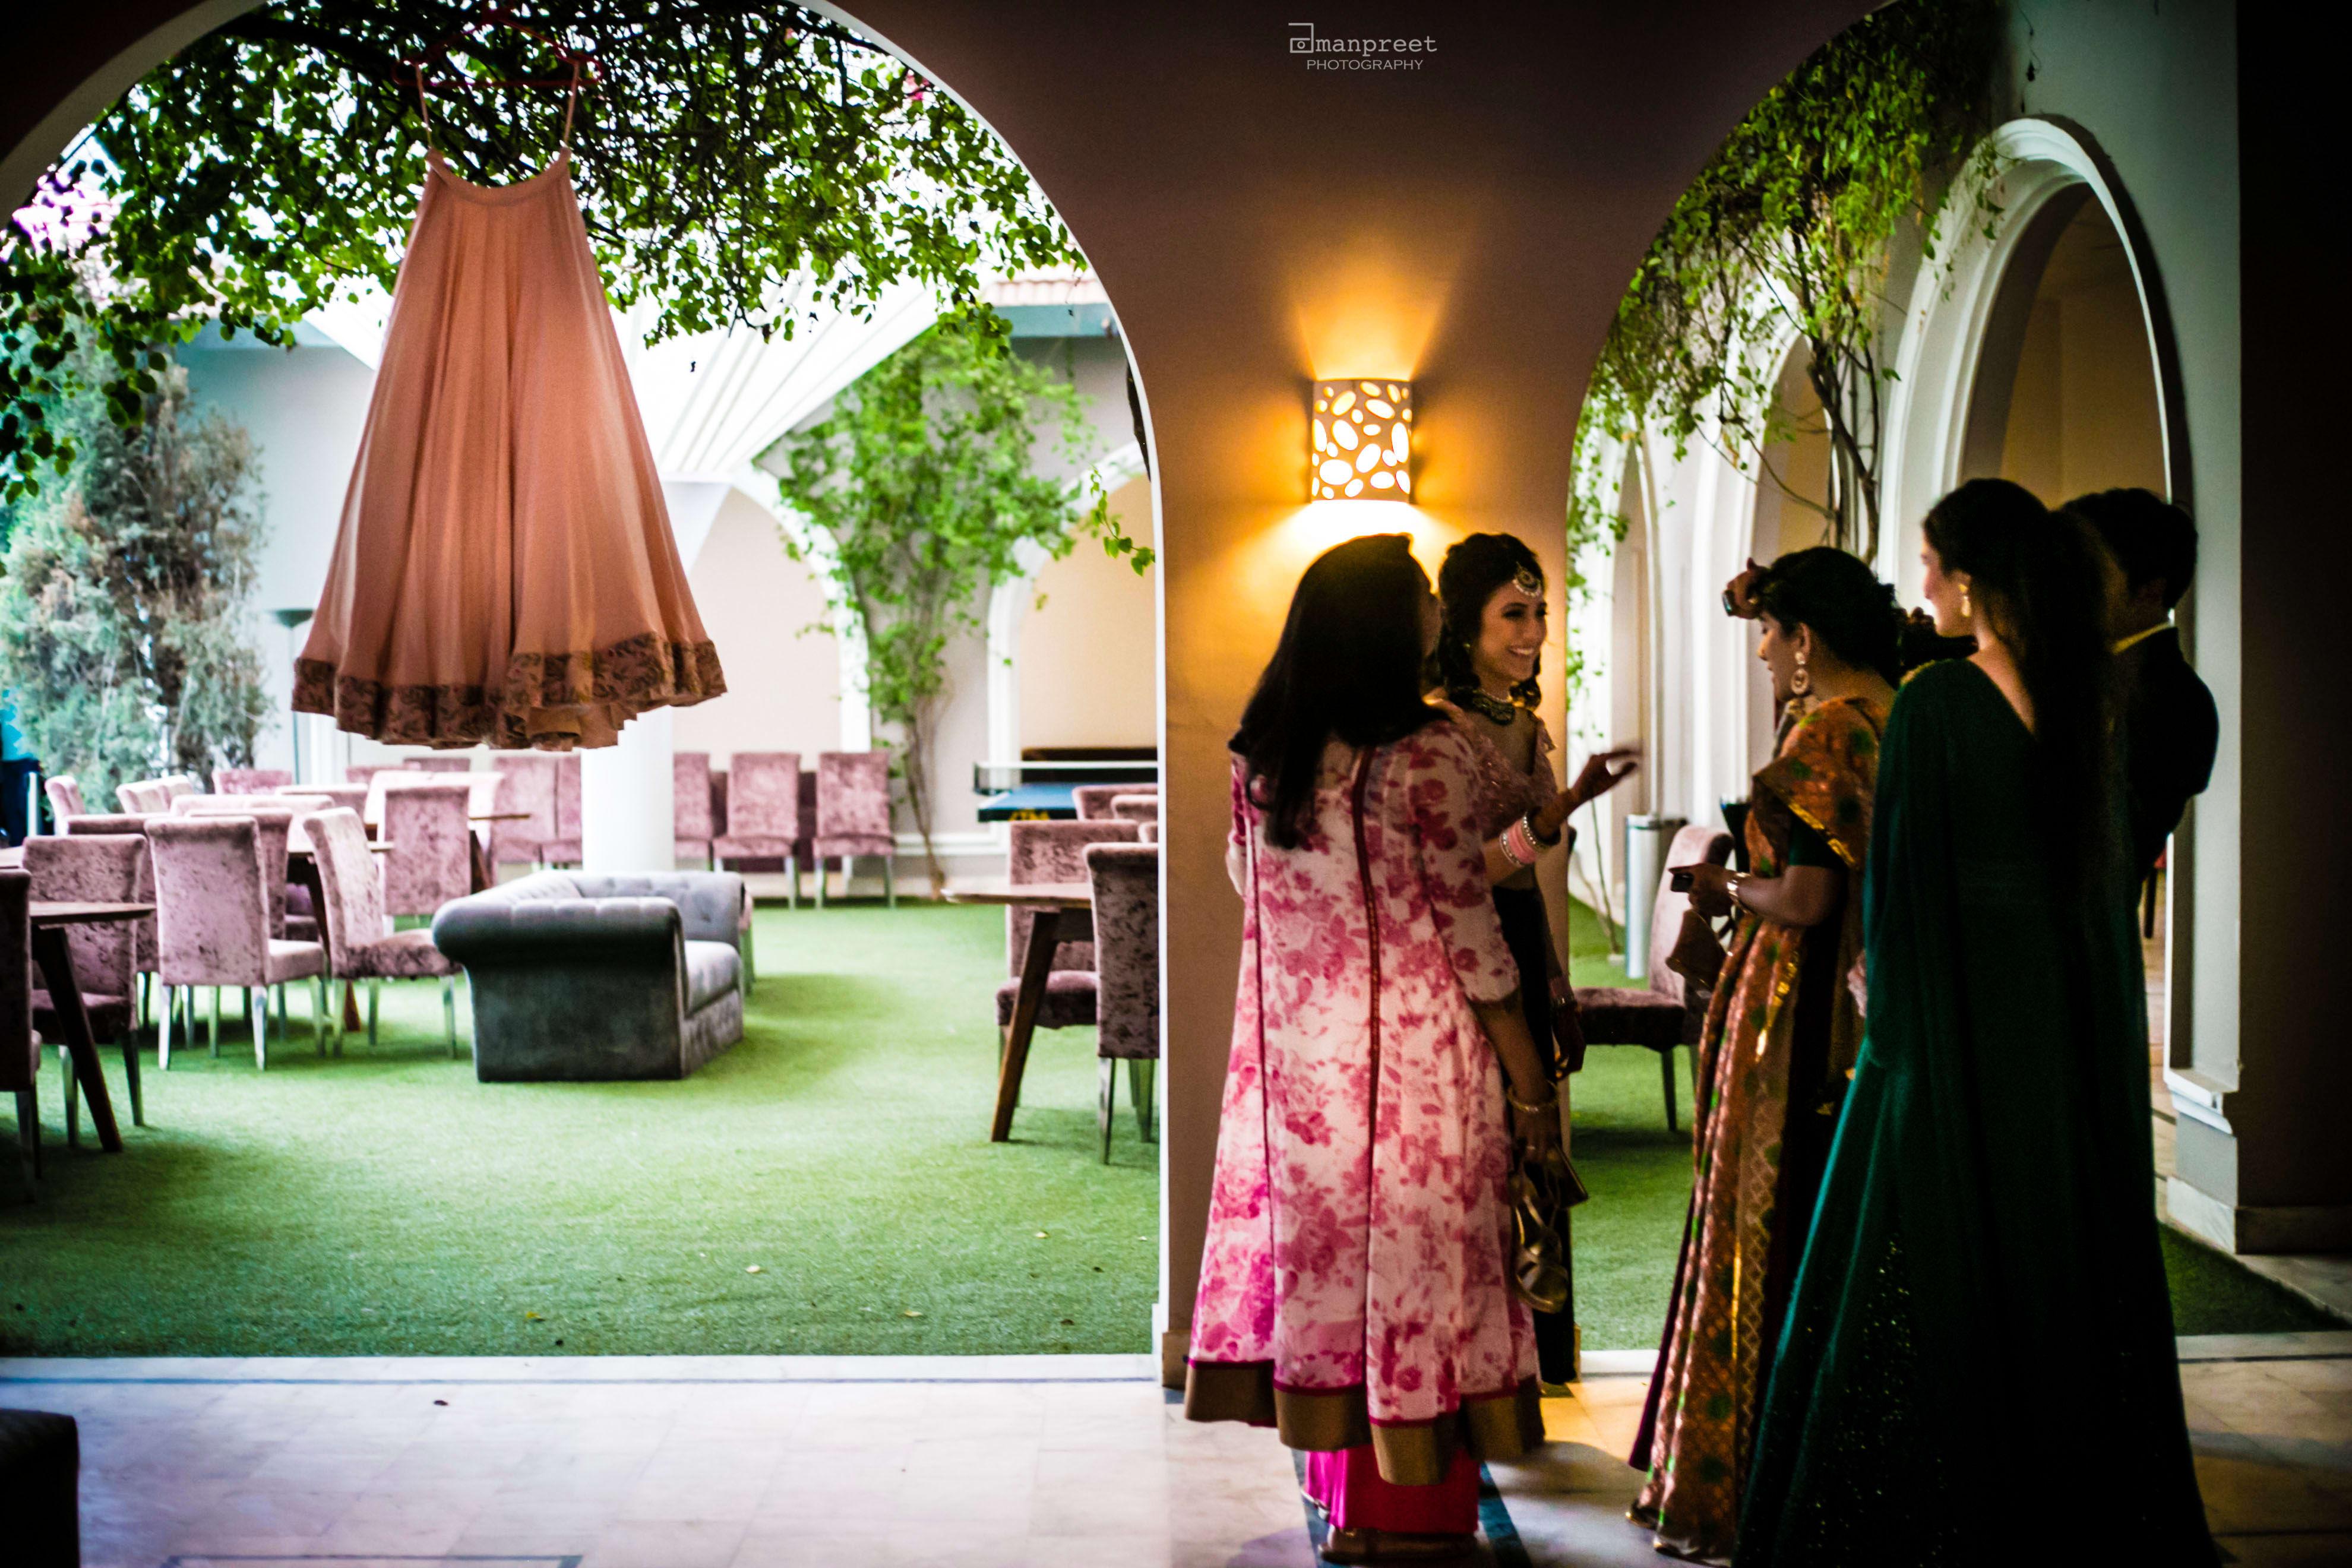 candid clicks!:geetanjali salon, raju mehandi wala, amanpreet photography, ole couture